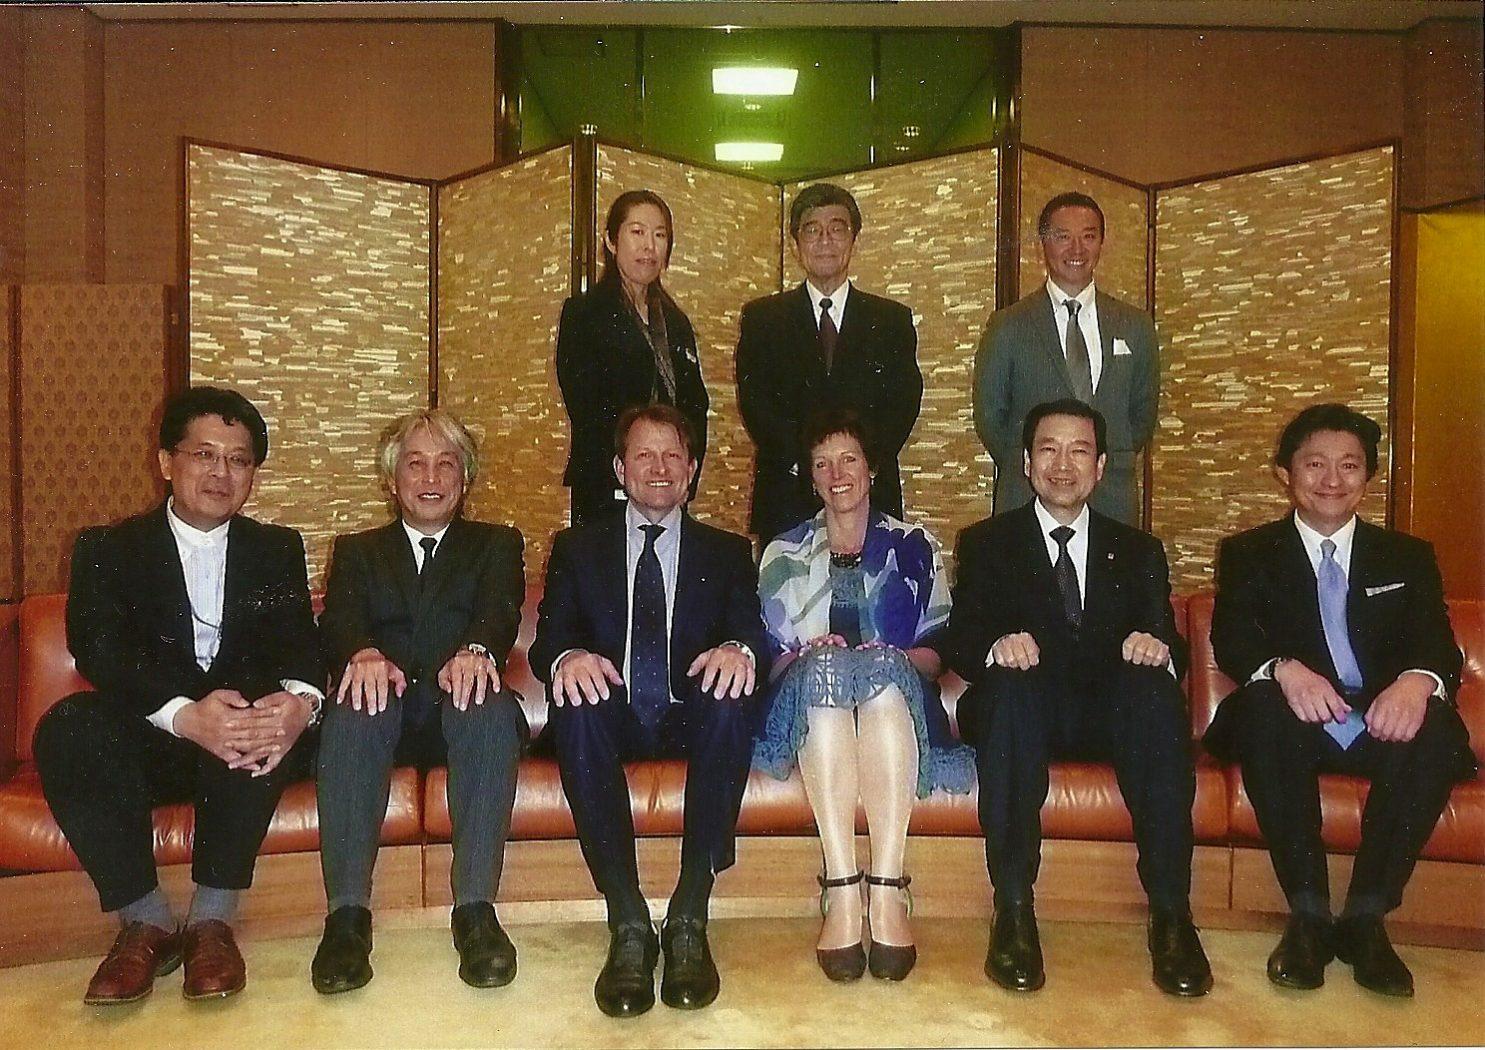 4. Tokyo (3. Sompo Staff with Mr. de Lorm)